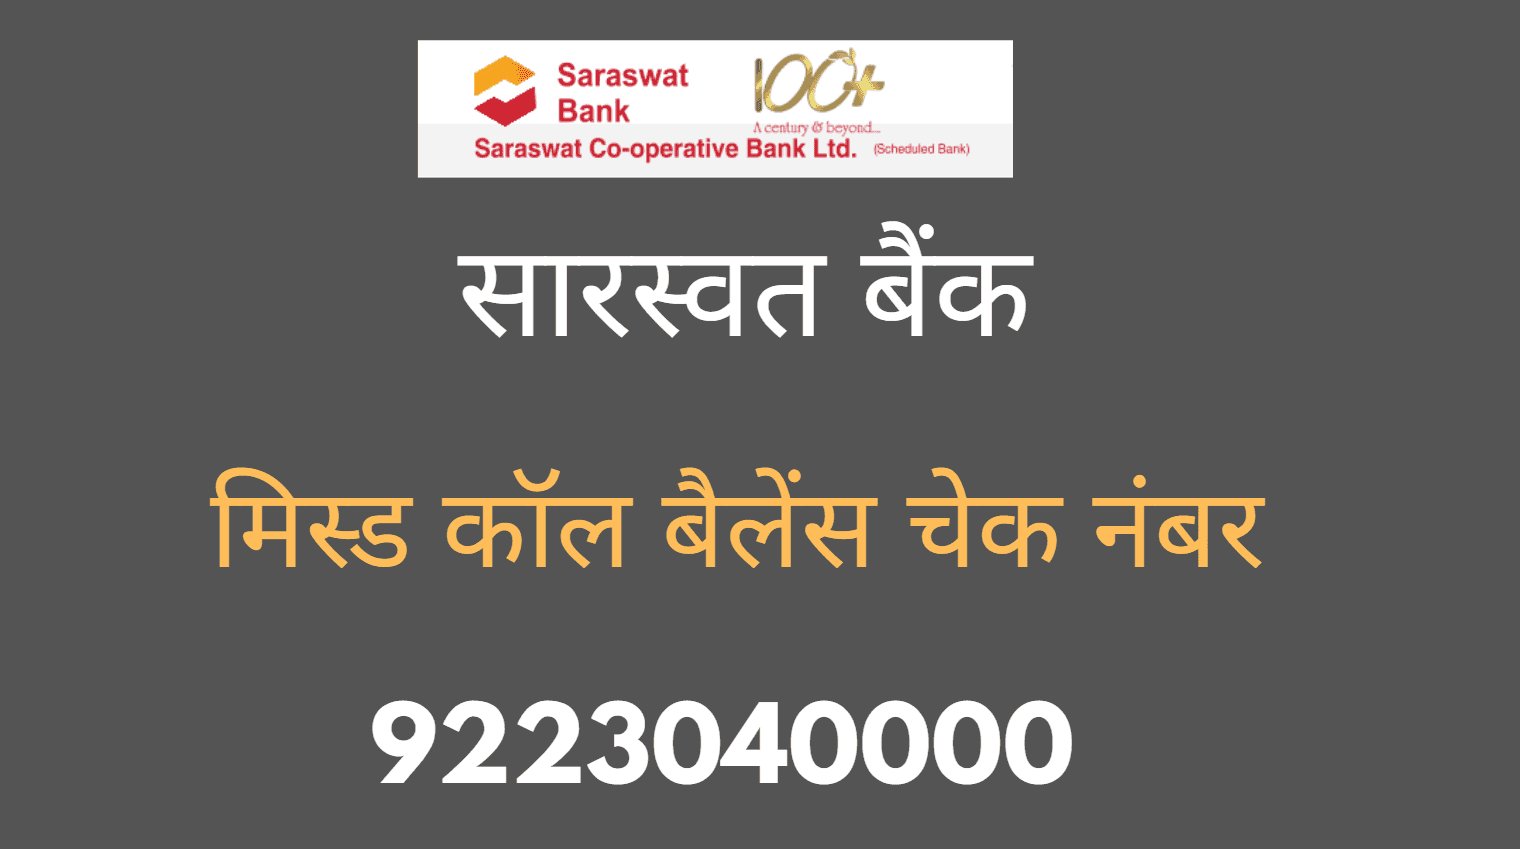 saraswat bank missed call balance check number